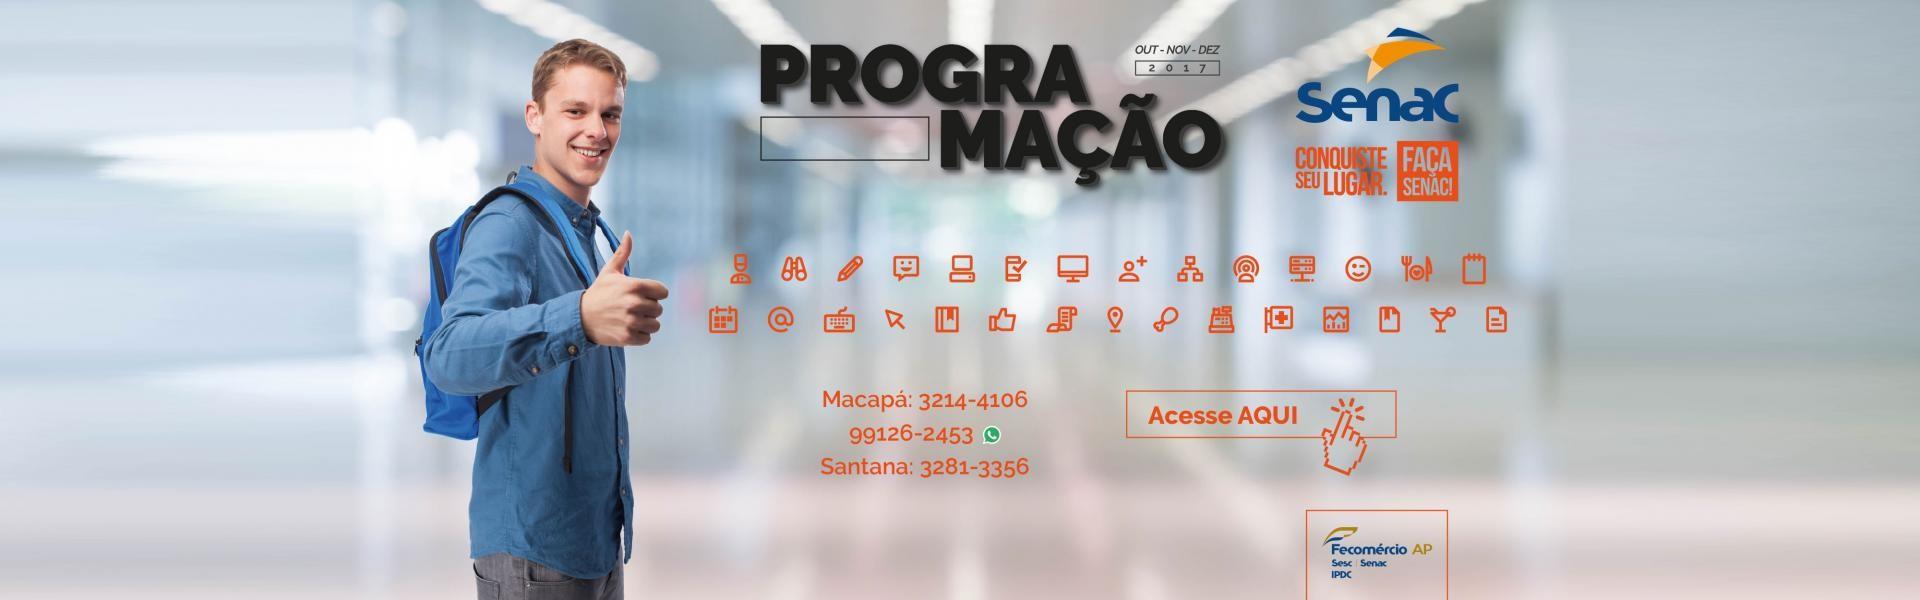 Programação Senac